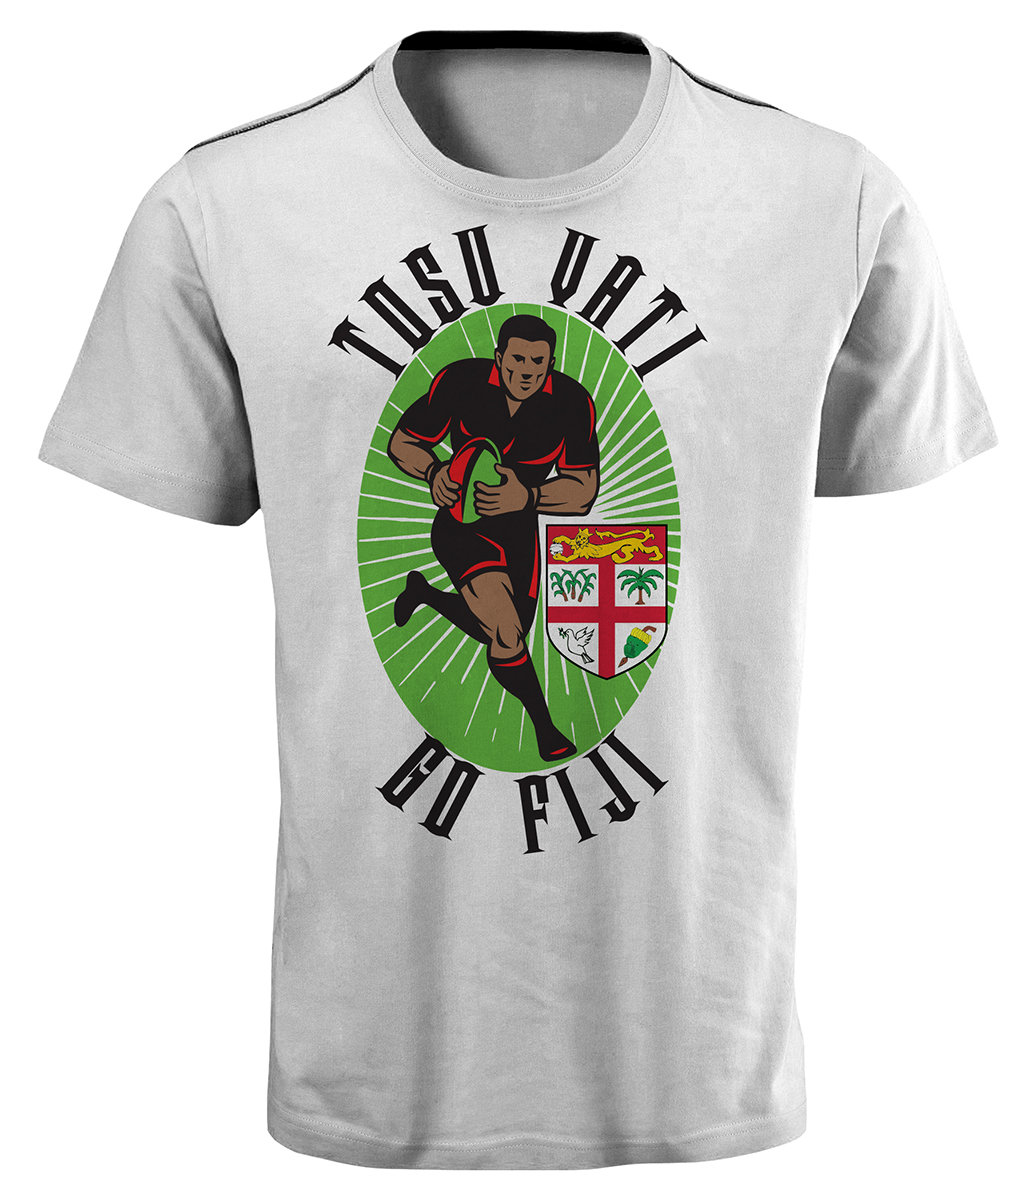 Shirt design inspiration - T Shirt Design By Fcurtis Fcurtis